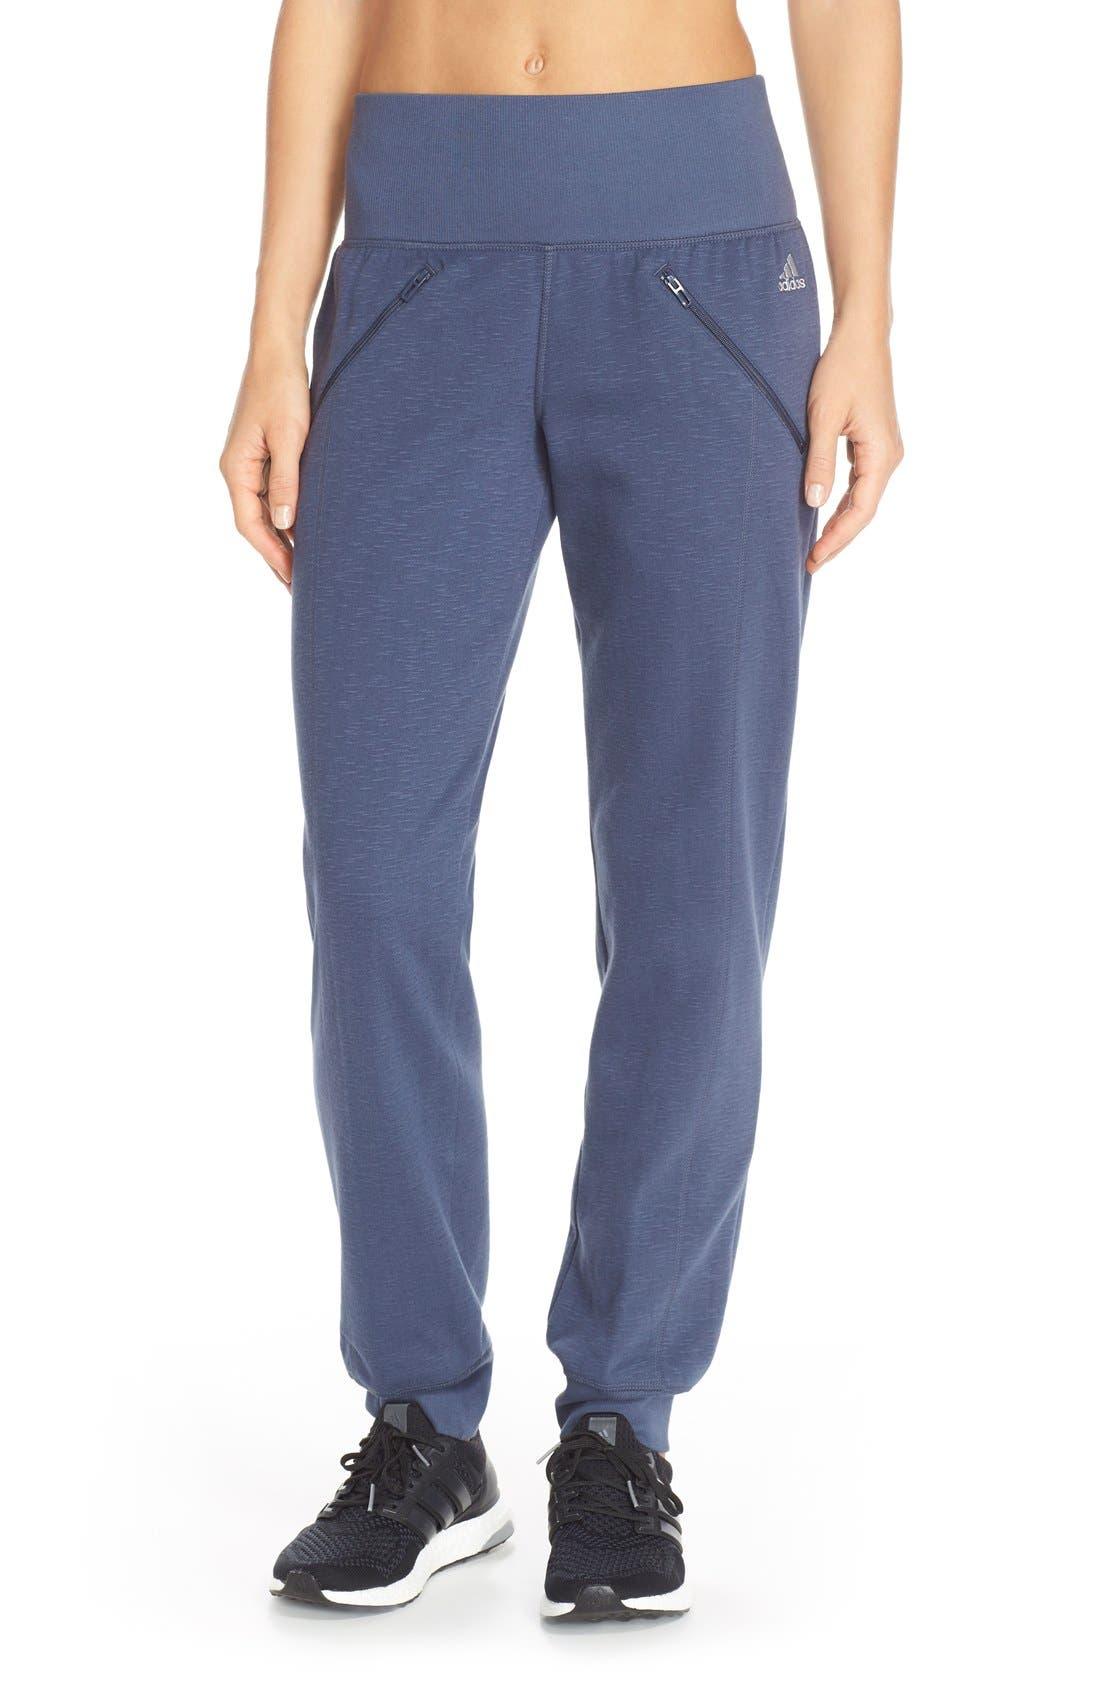 Alternate Image 1 Selected - adidas 'Cozy' Fleece Jogger Pants